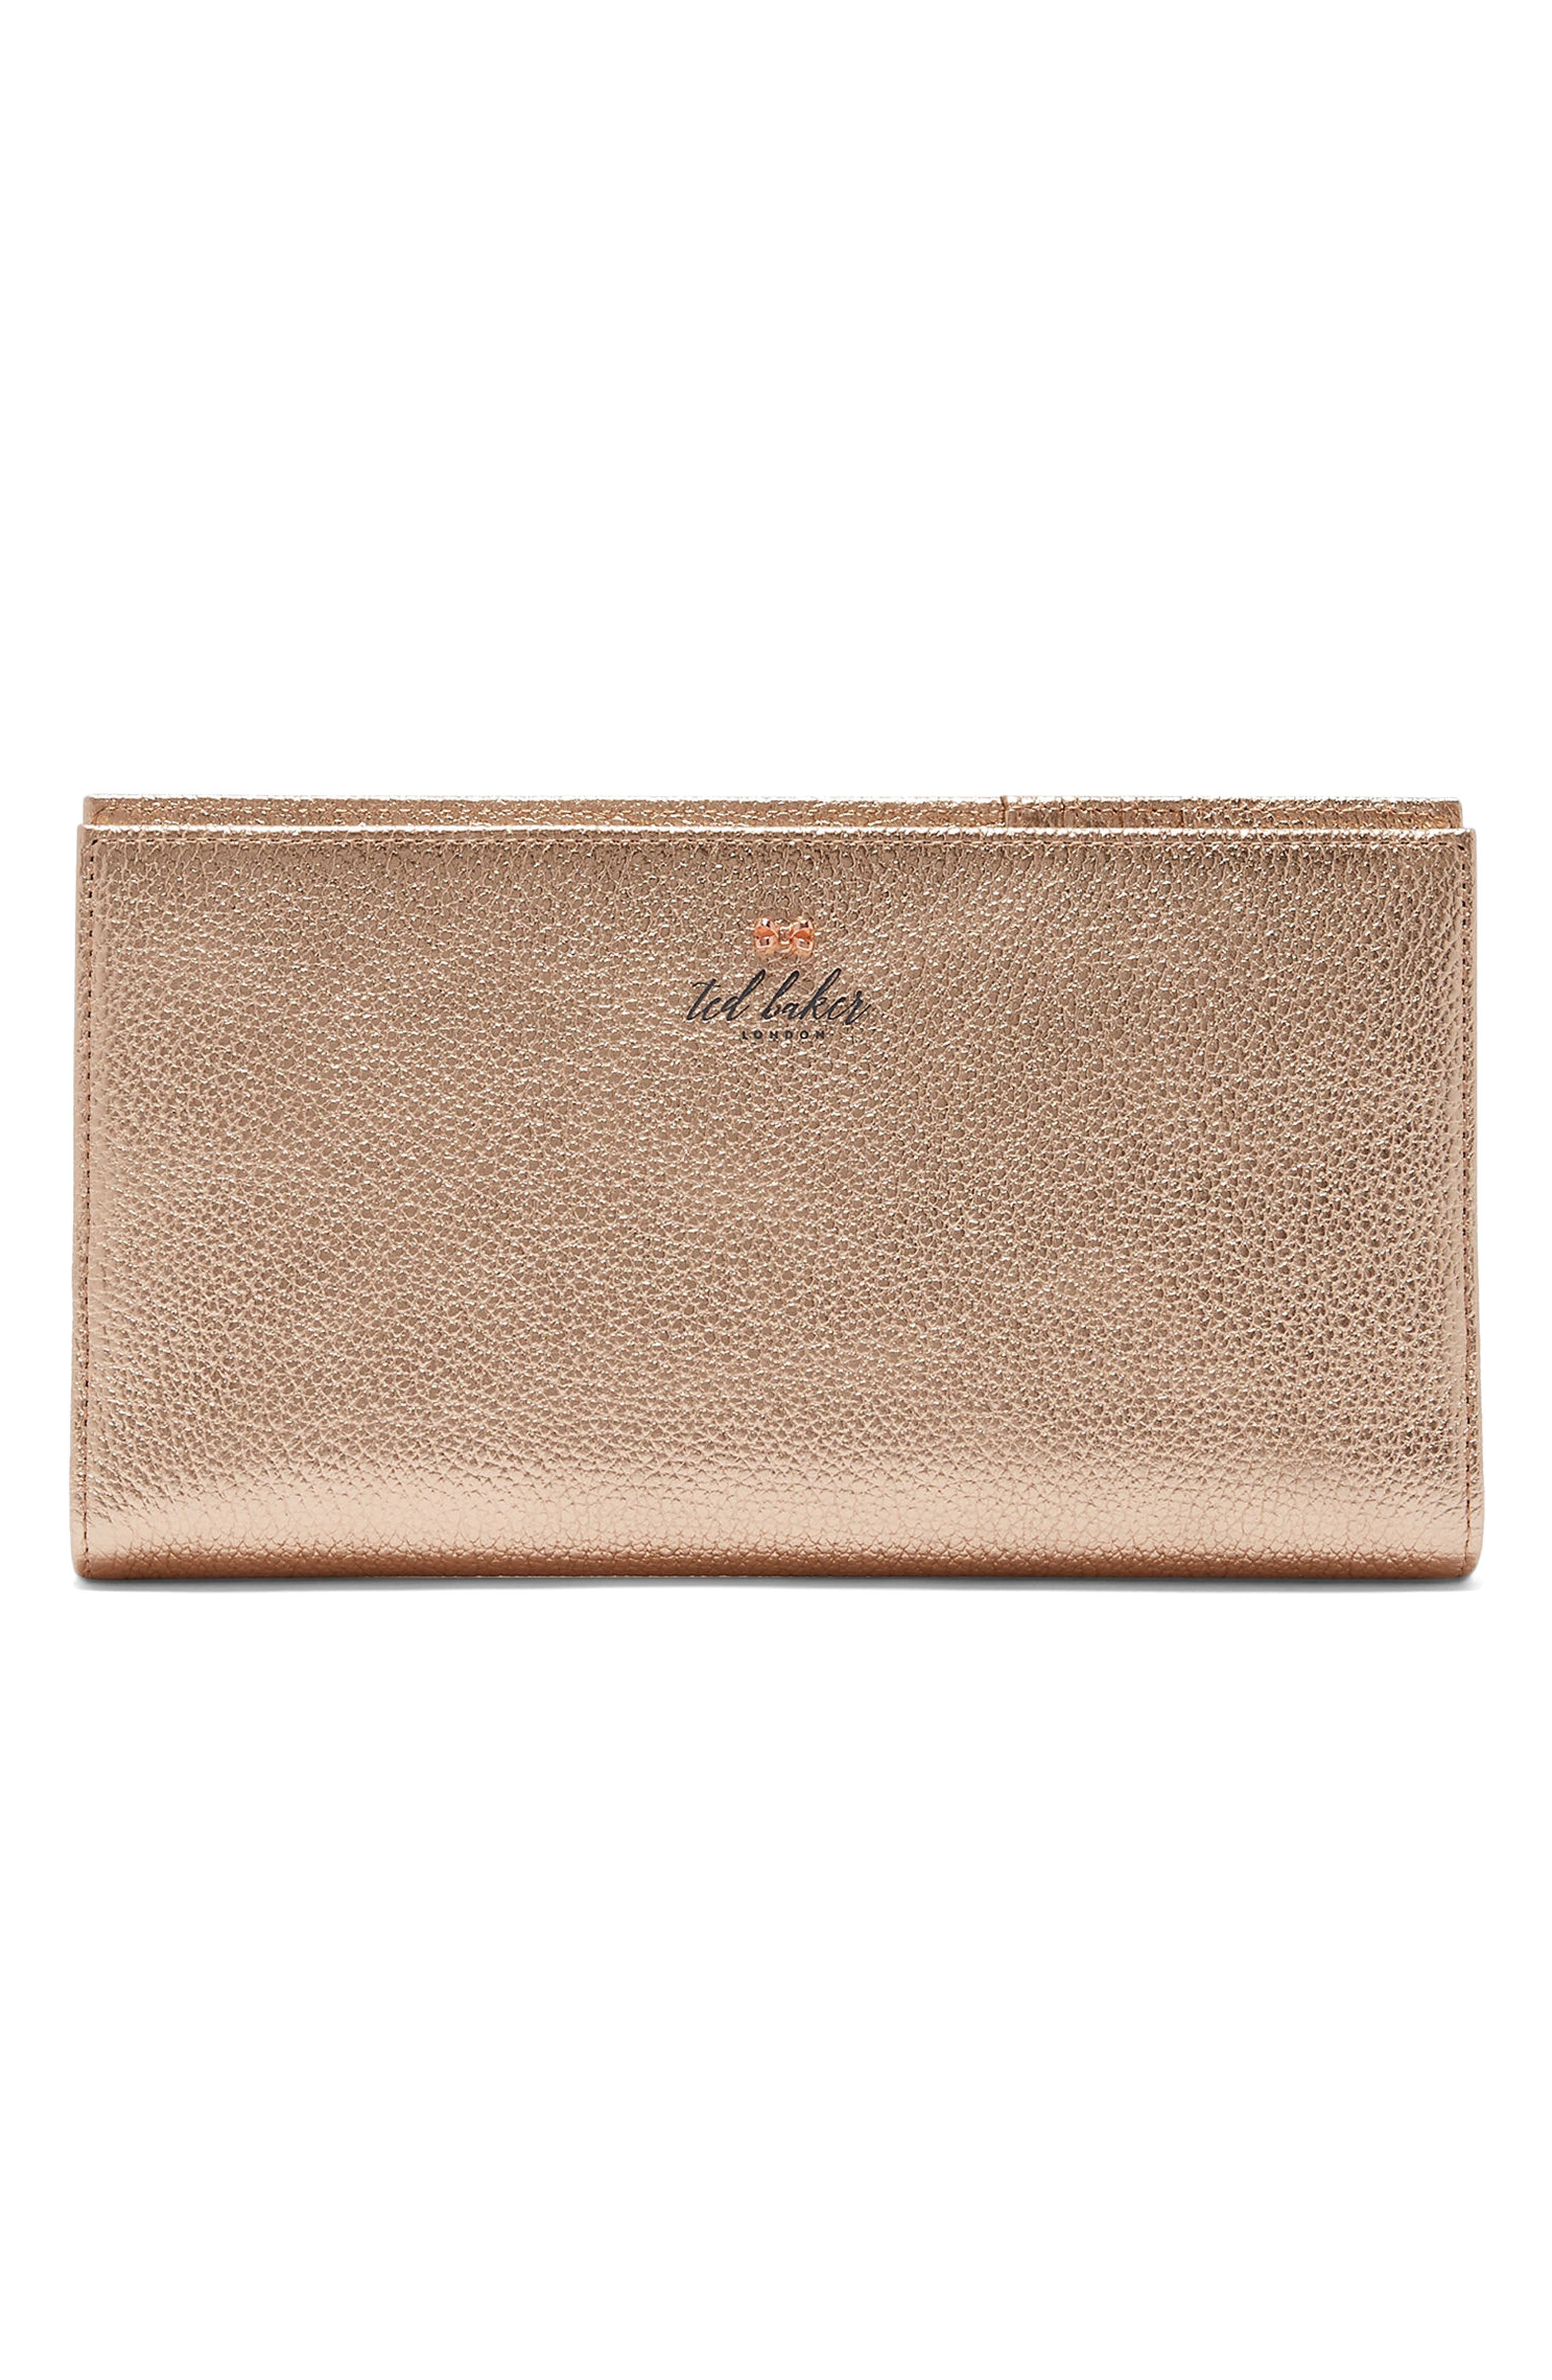 Kayy Metallic Leather Travel Wallet,                             Main thumbnail 1, color,                             Rose Gold